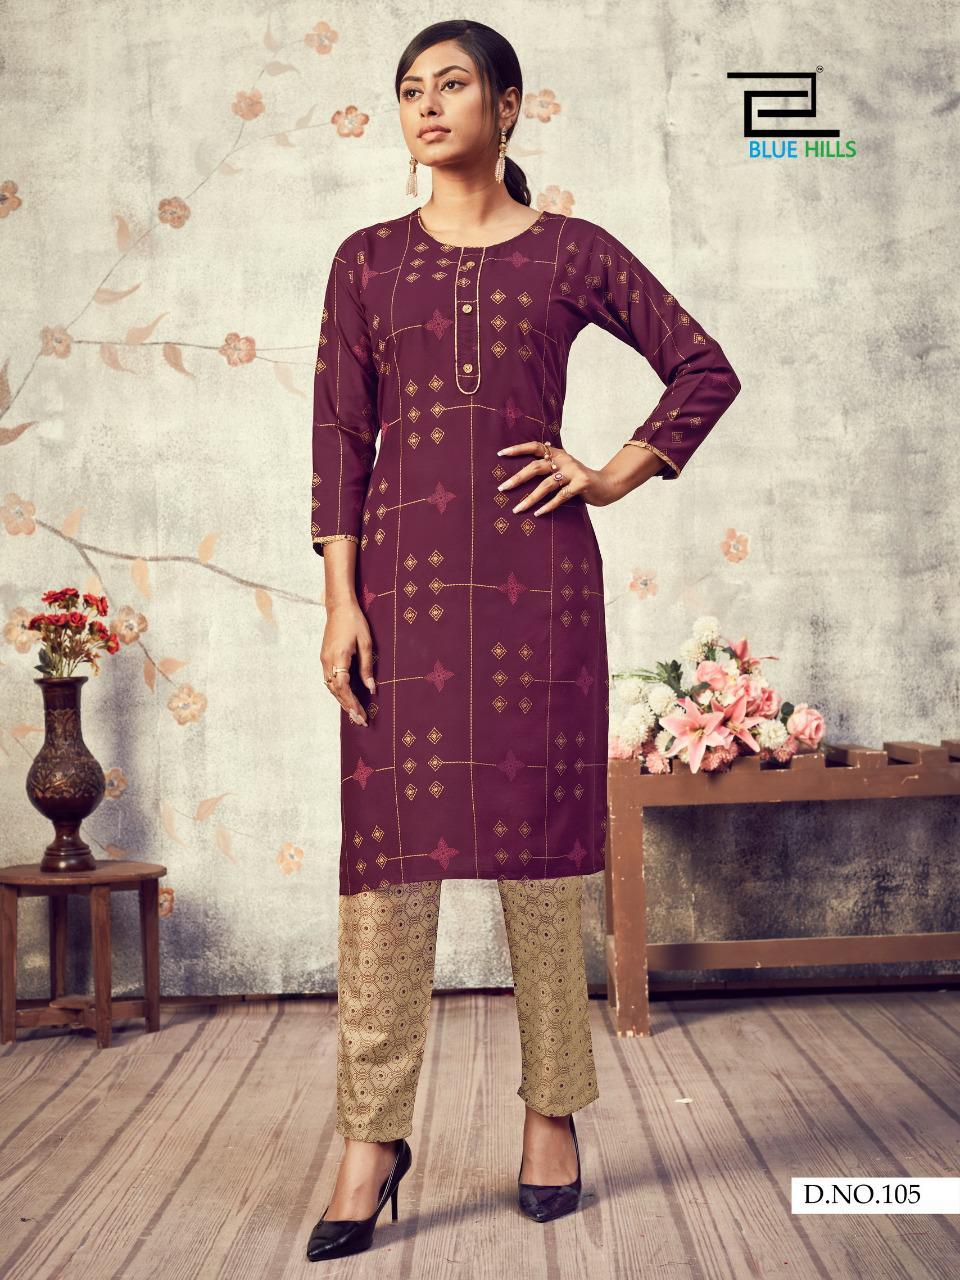 Blue Hills Jasmine Kurti with Pant Wholesale Catalog 10 Pcs 10 - Blue Hills Jasmine Kurti with Pant Wholesale Catalog 10 Pcs